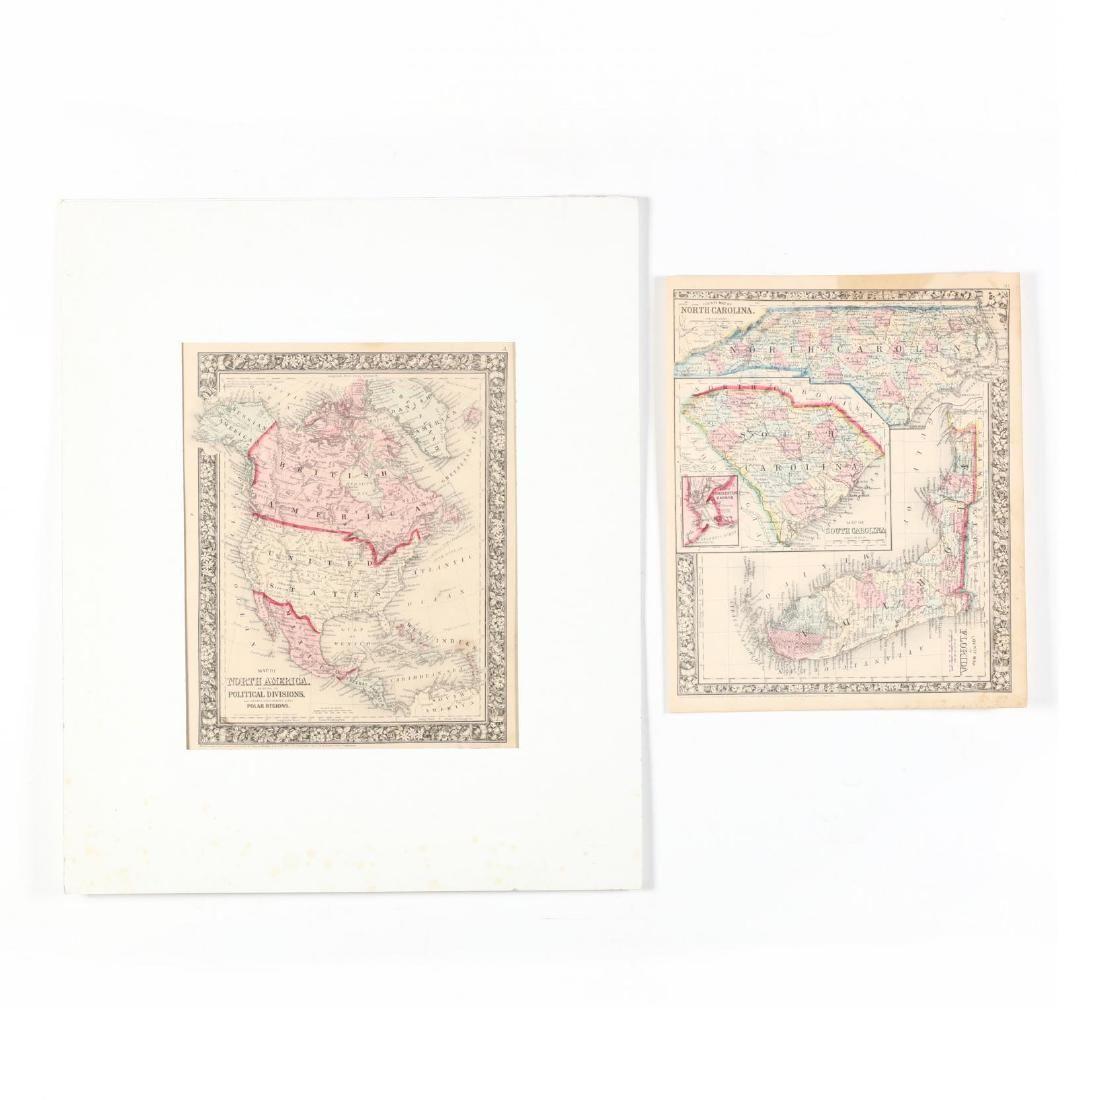 Two Civil War Era Mitchell Maps